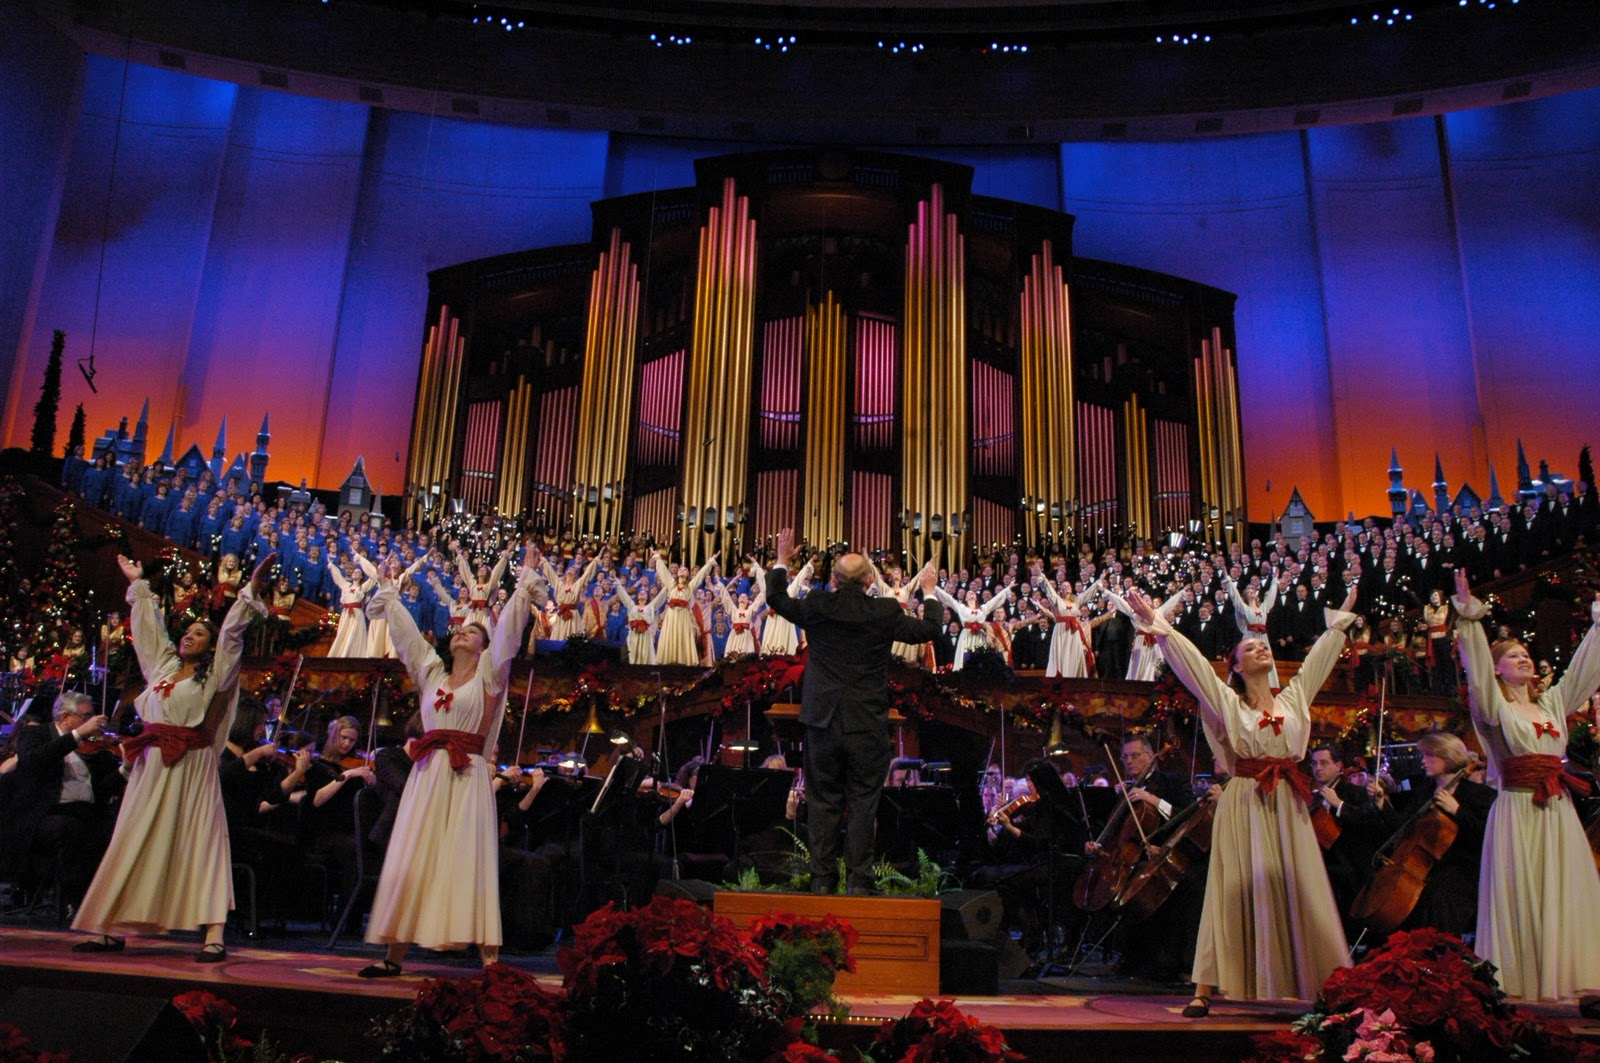 mormon tabernacle choir christmas concert 2010 guest